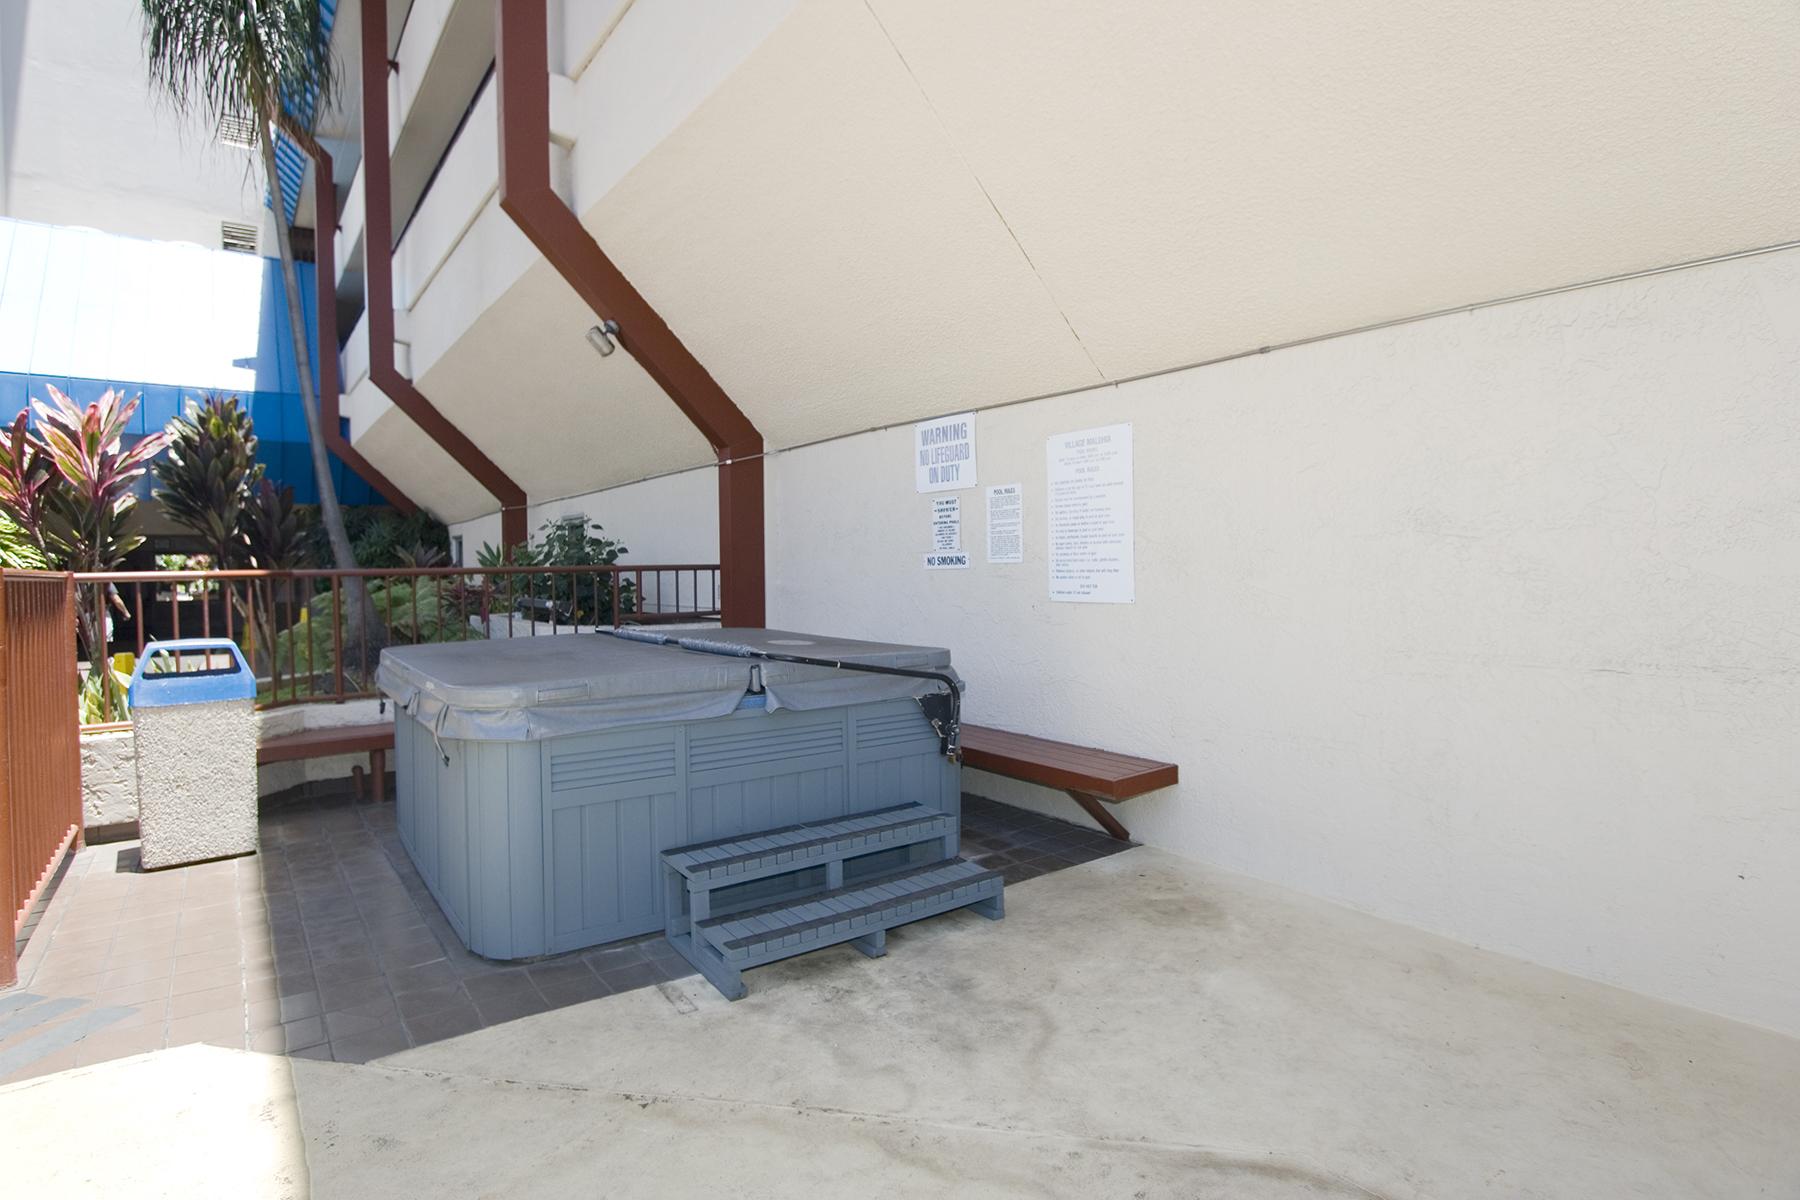 Jacuzzi / Hot Tub at 1535 Pensacola St #711, Honolulu, HI 96822